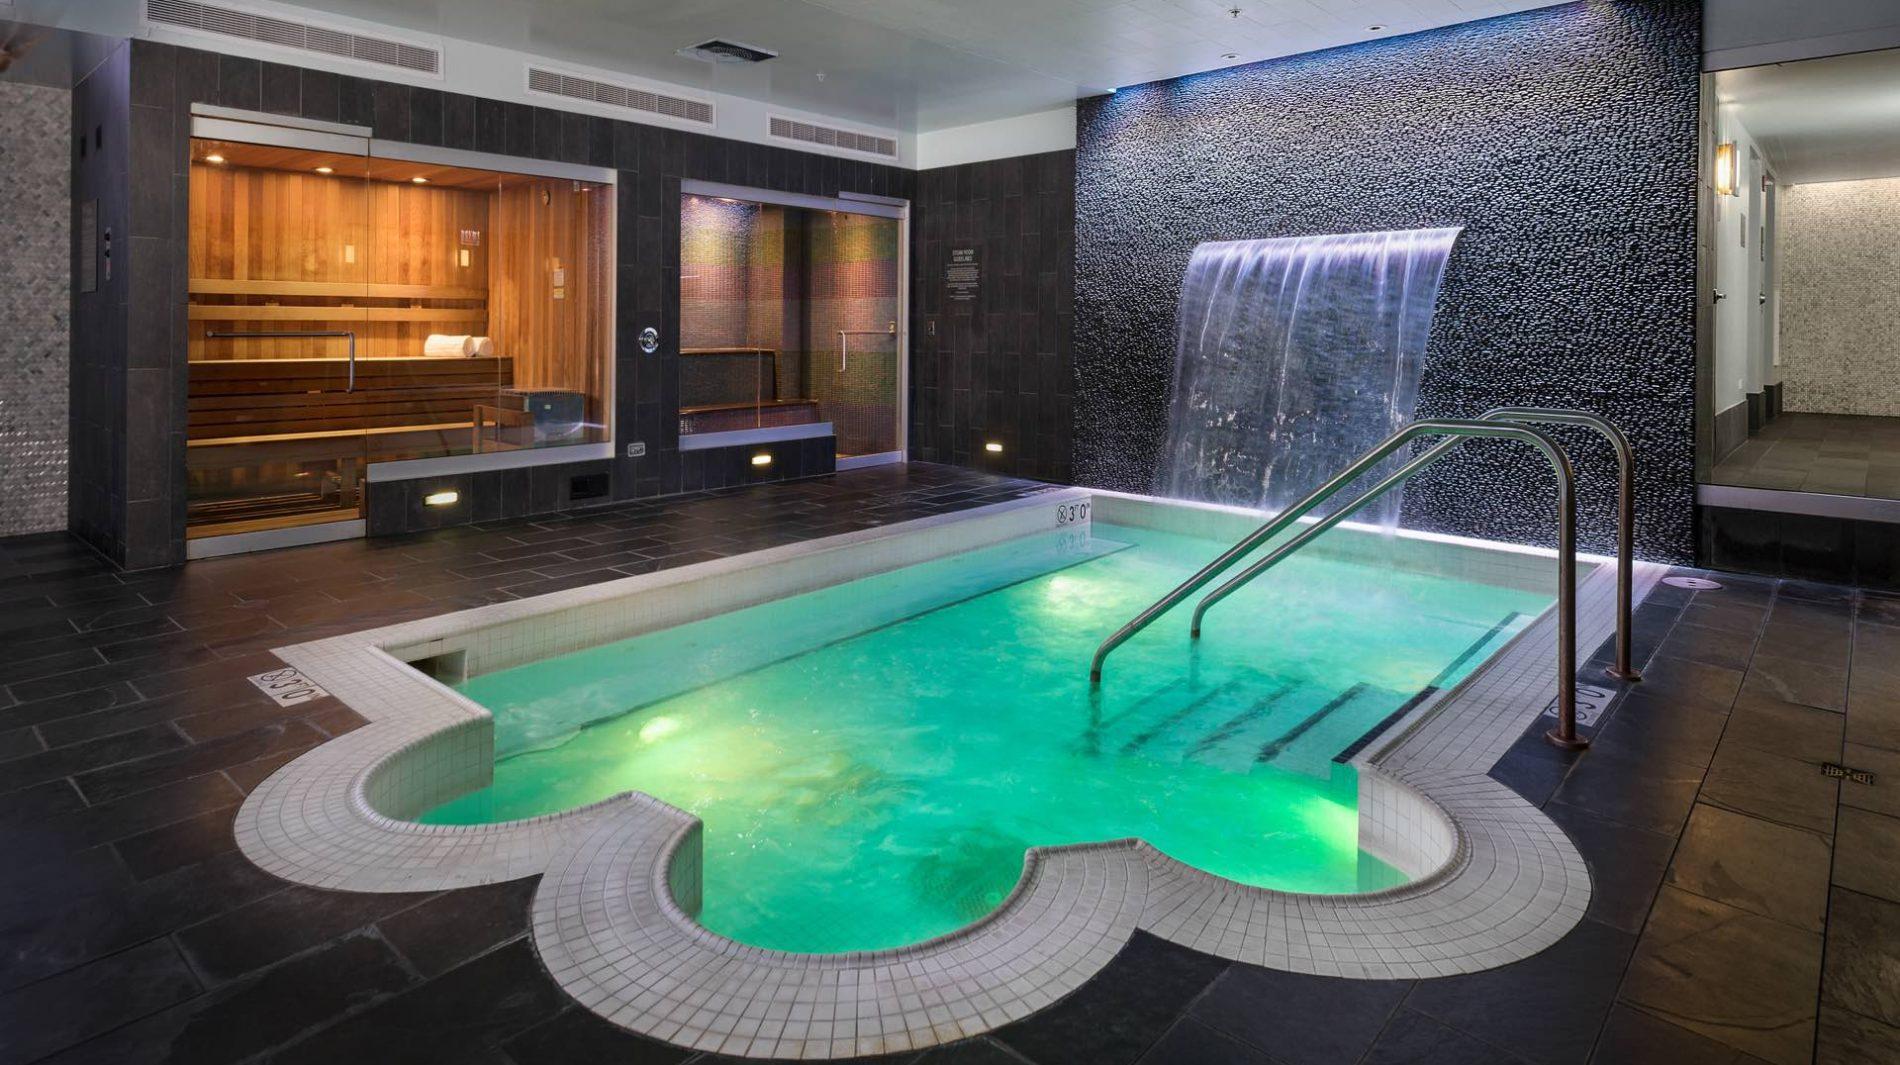 Serene indoor spa featuring indoor pool, steam room, sauna, and private massage room.